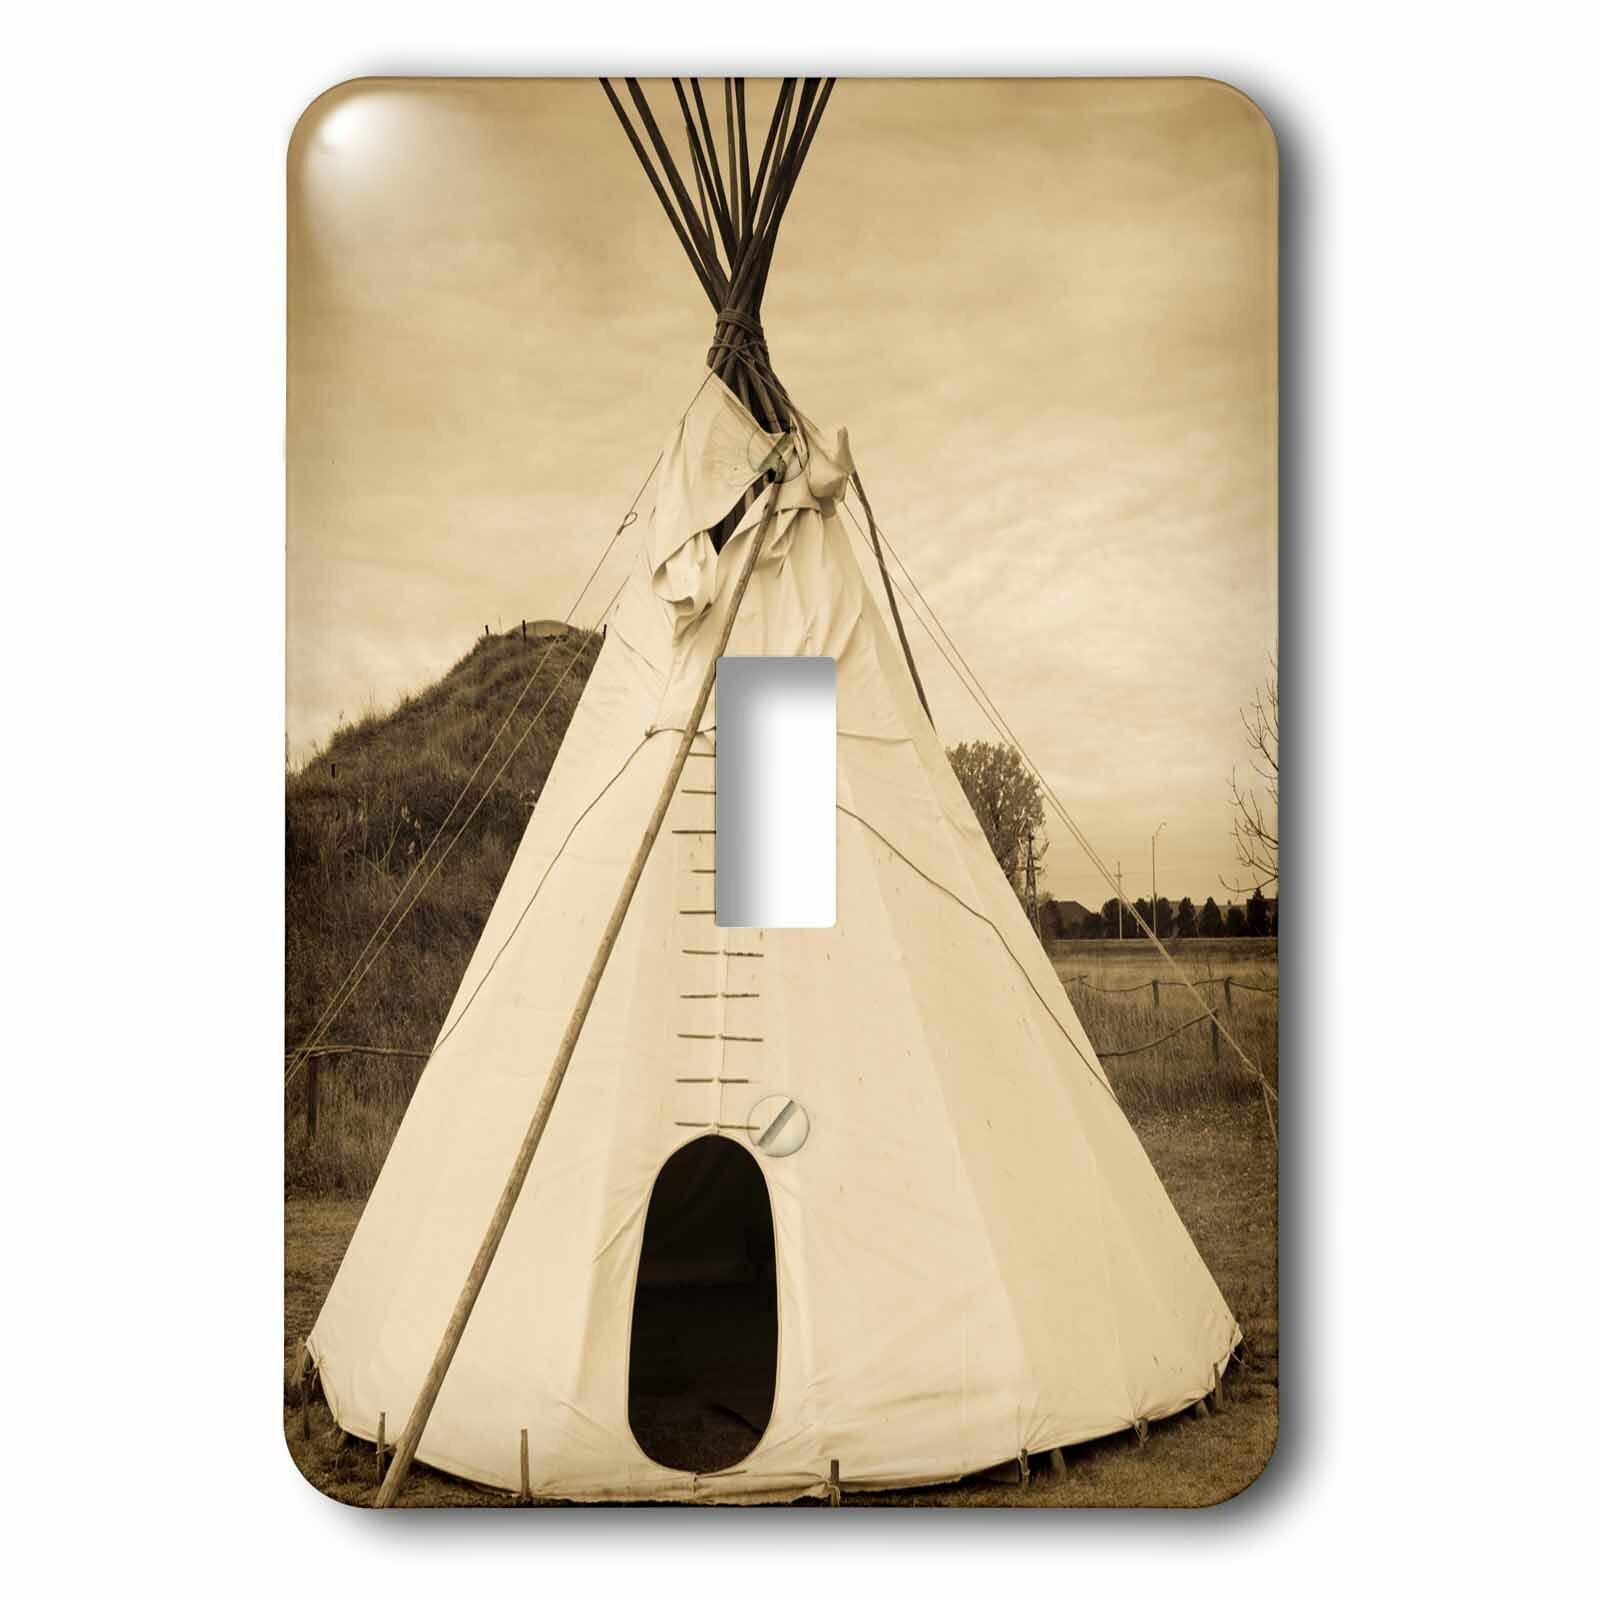 3drose Prairie Pioneer Teepee 1 Gang Toggle Light Switch Wall Plate Wayfair